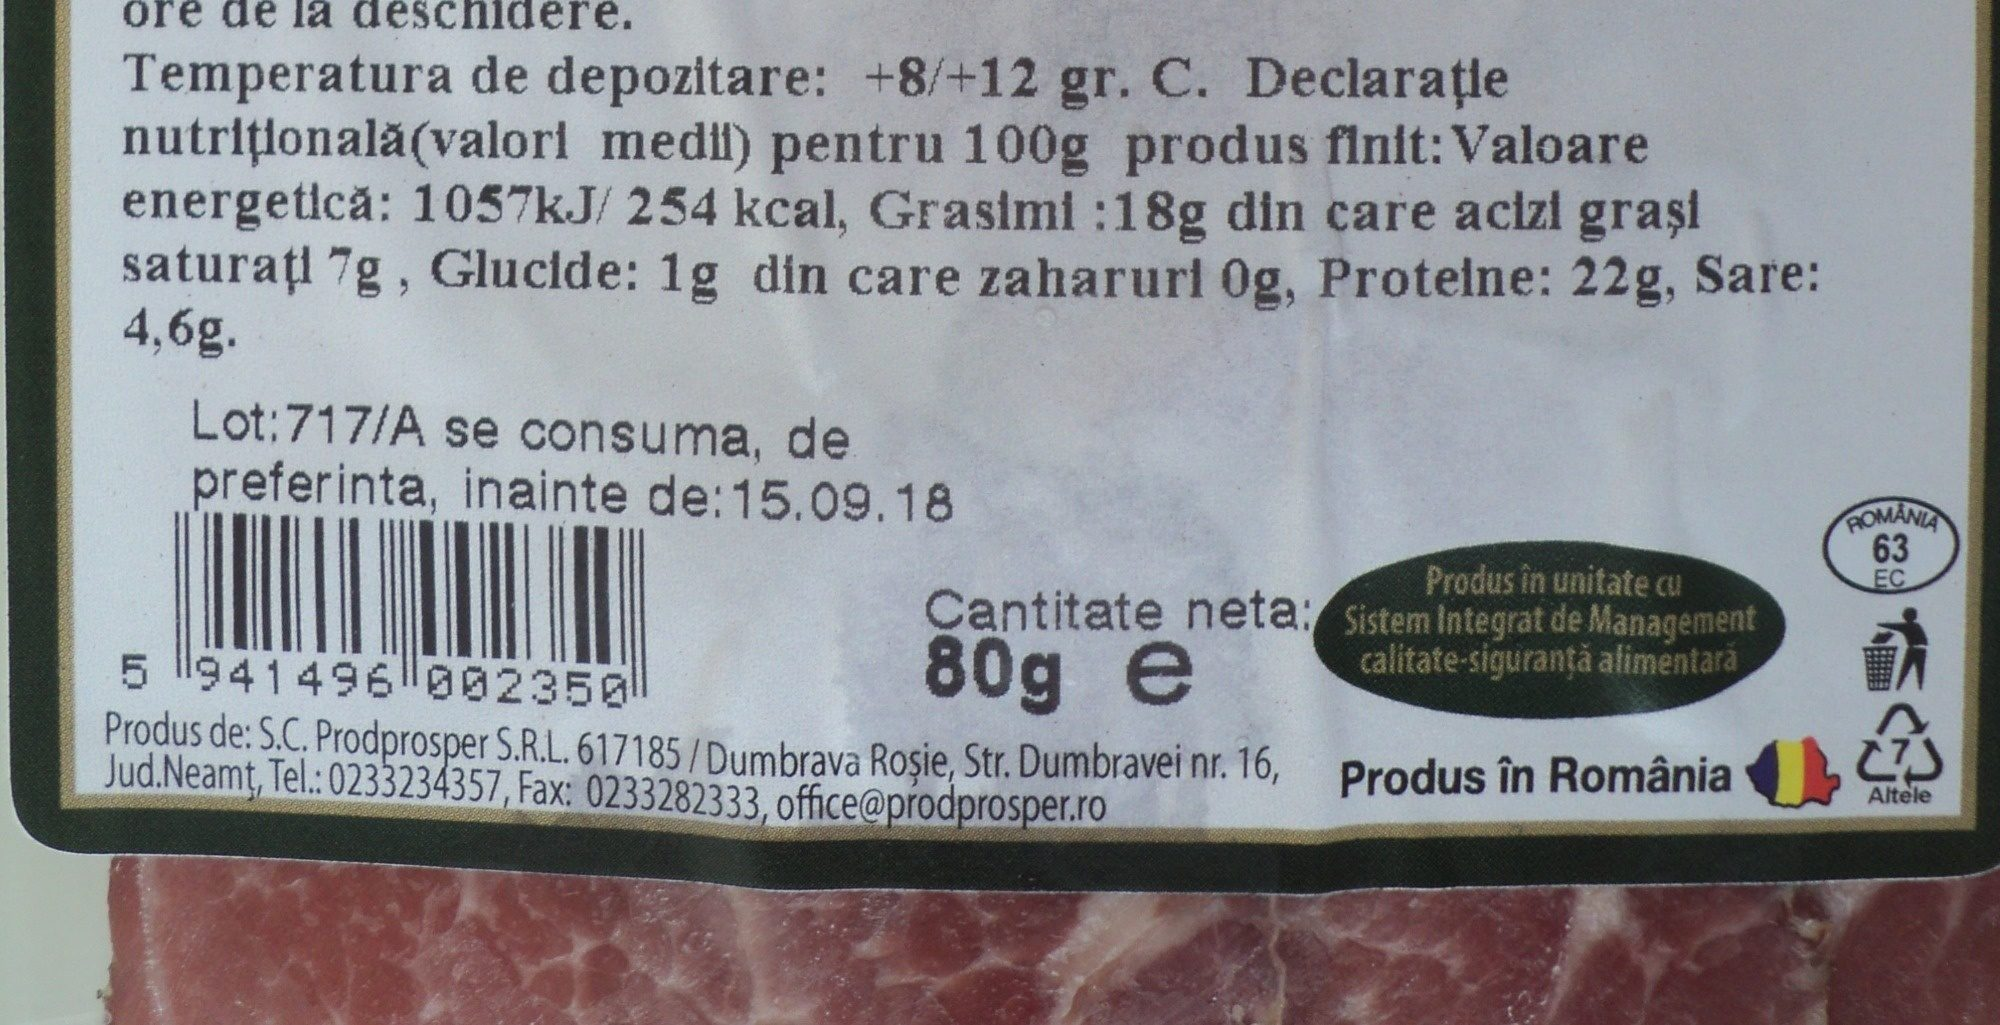 Premium Ceafa crud uscata, feliata - Nutrition facts - ro